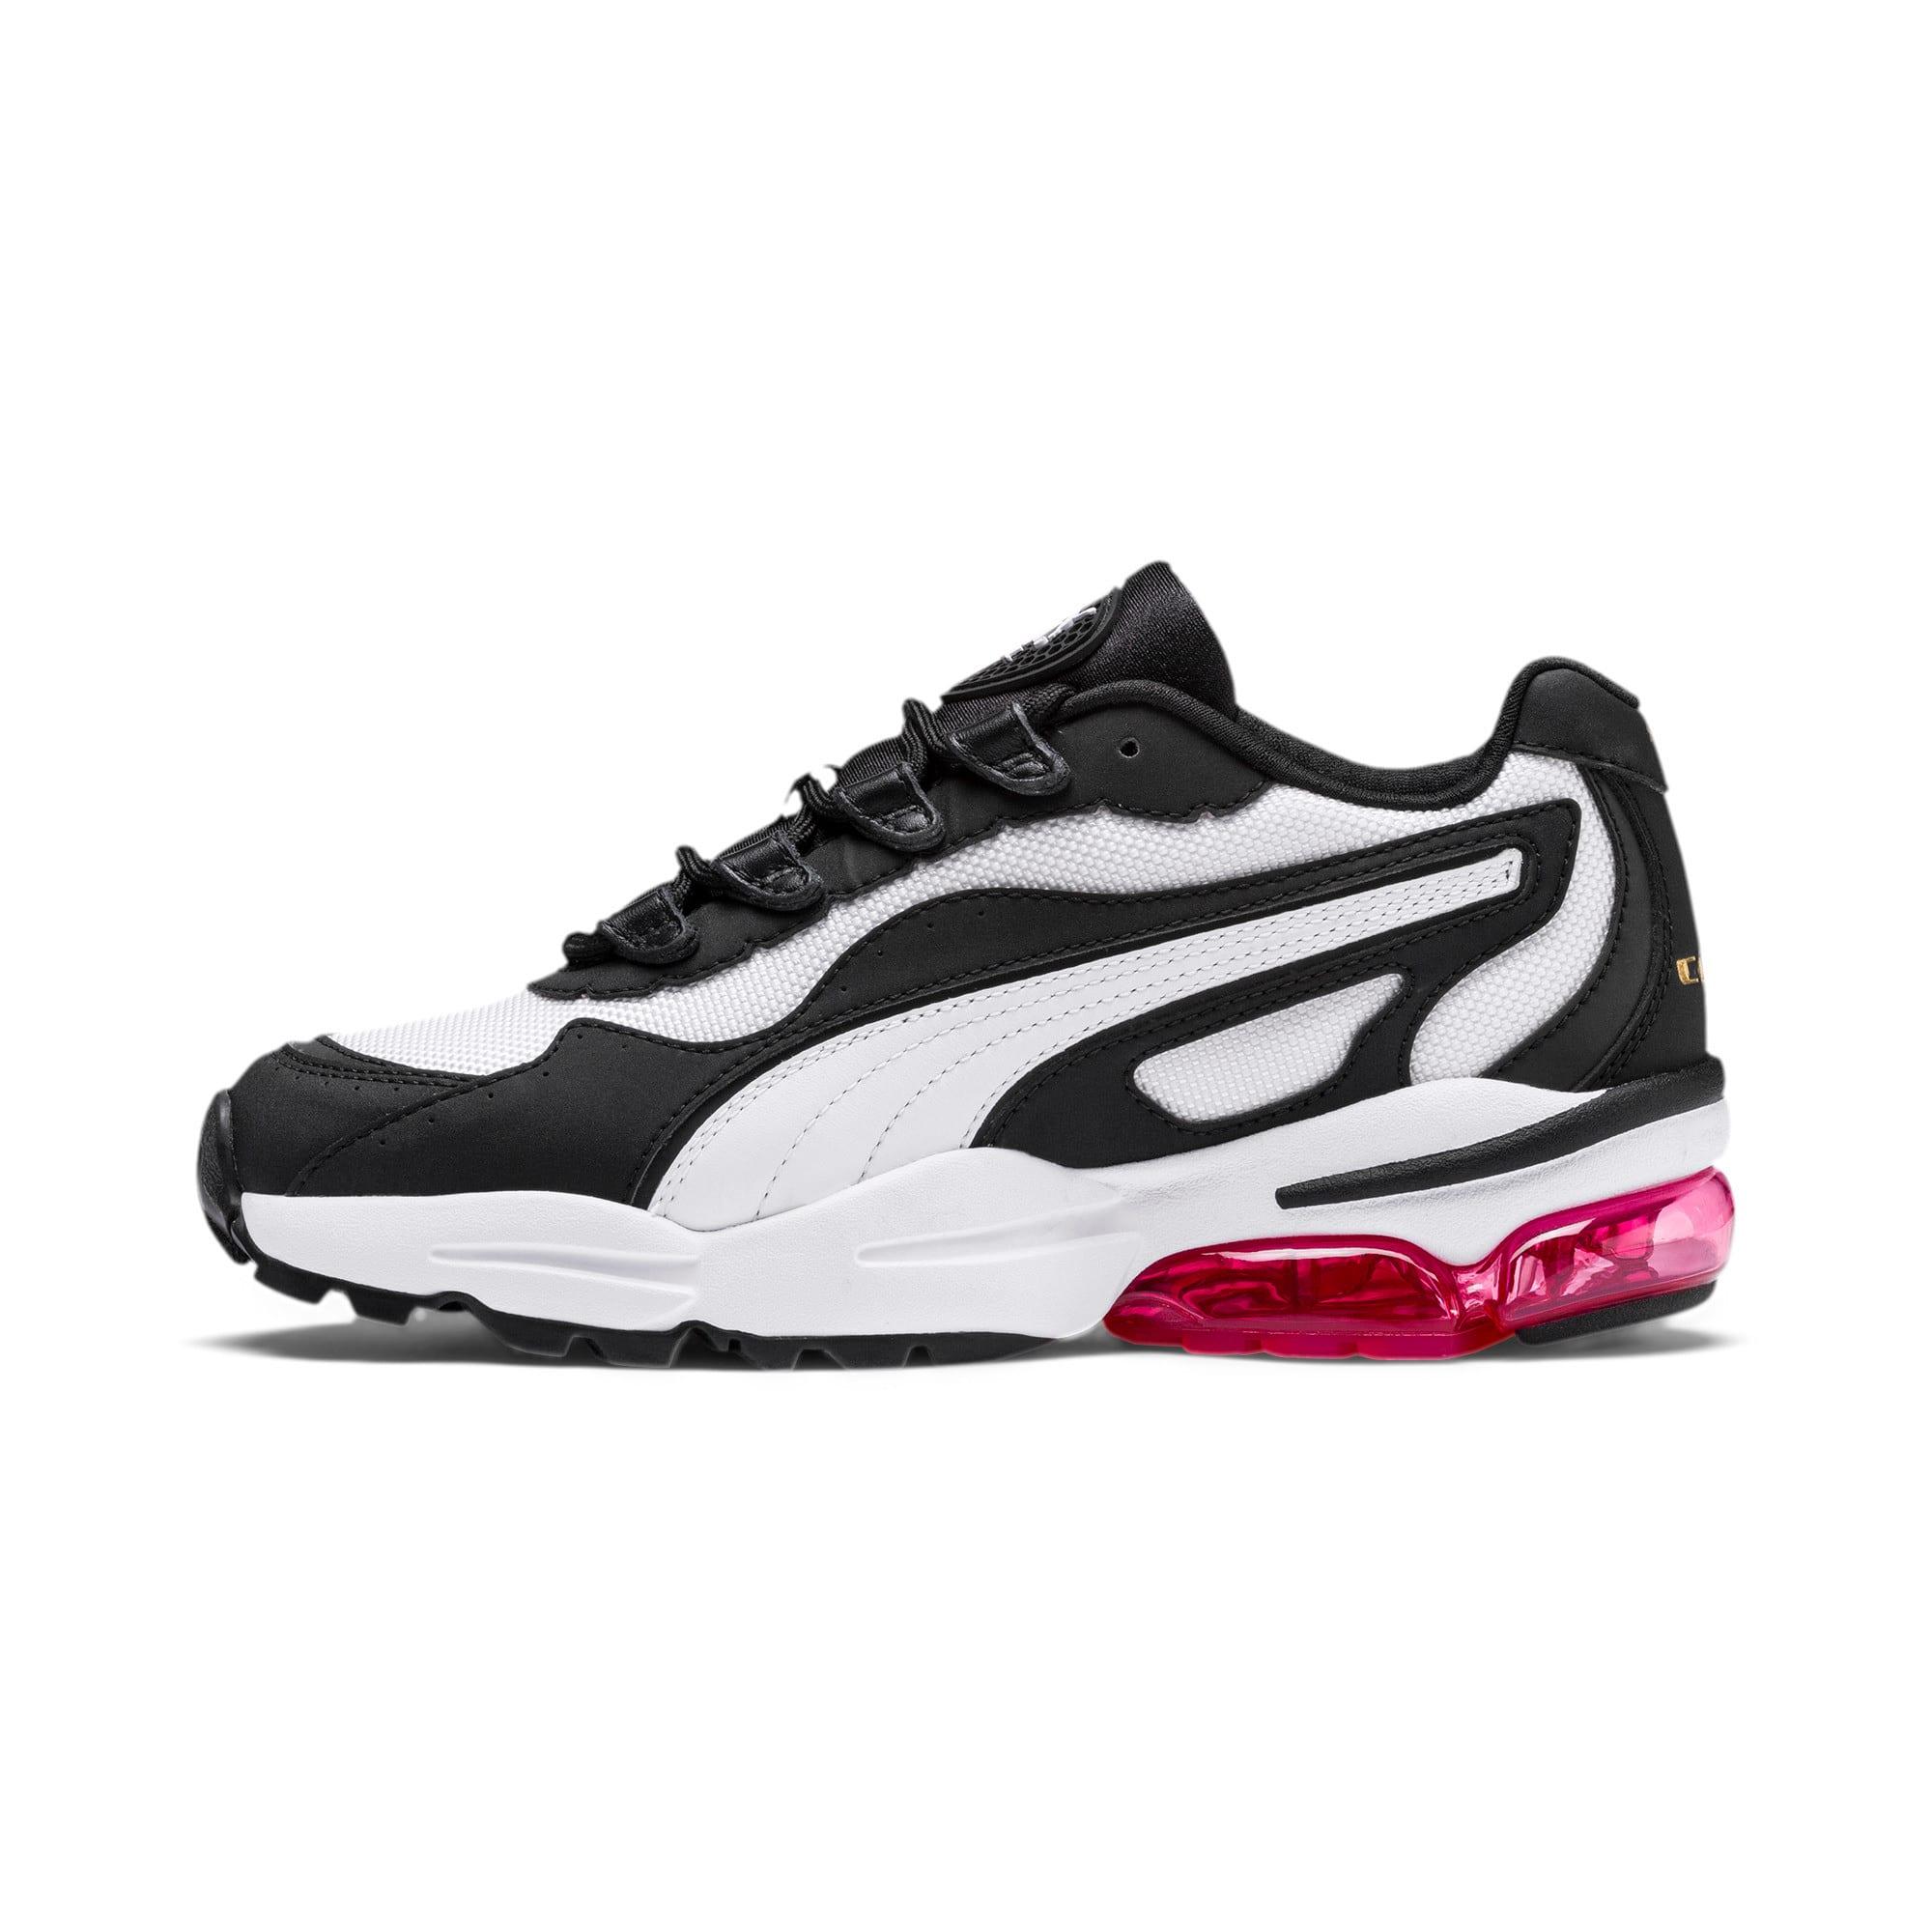 Miniatura 1 de Zapatos deportivos CELL Stellar para mujer, Puma White-Puma Black, mediano